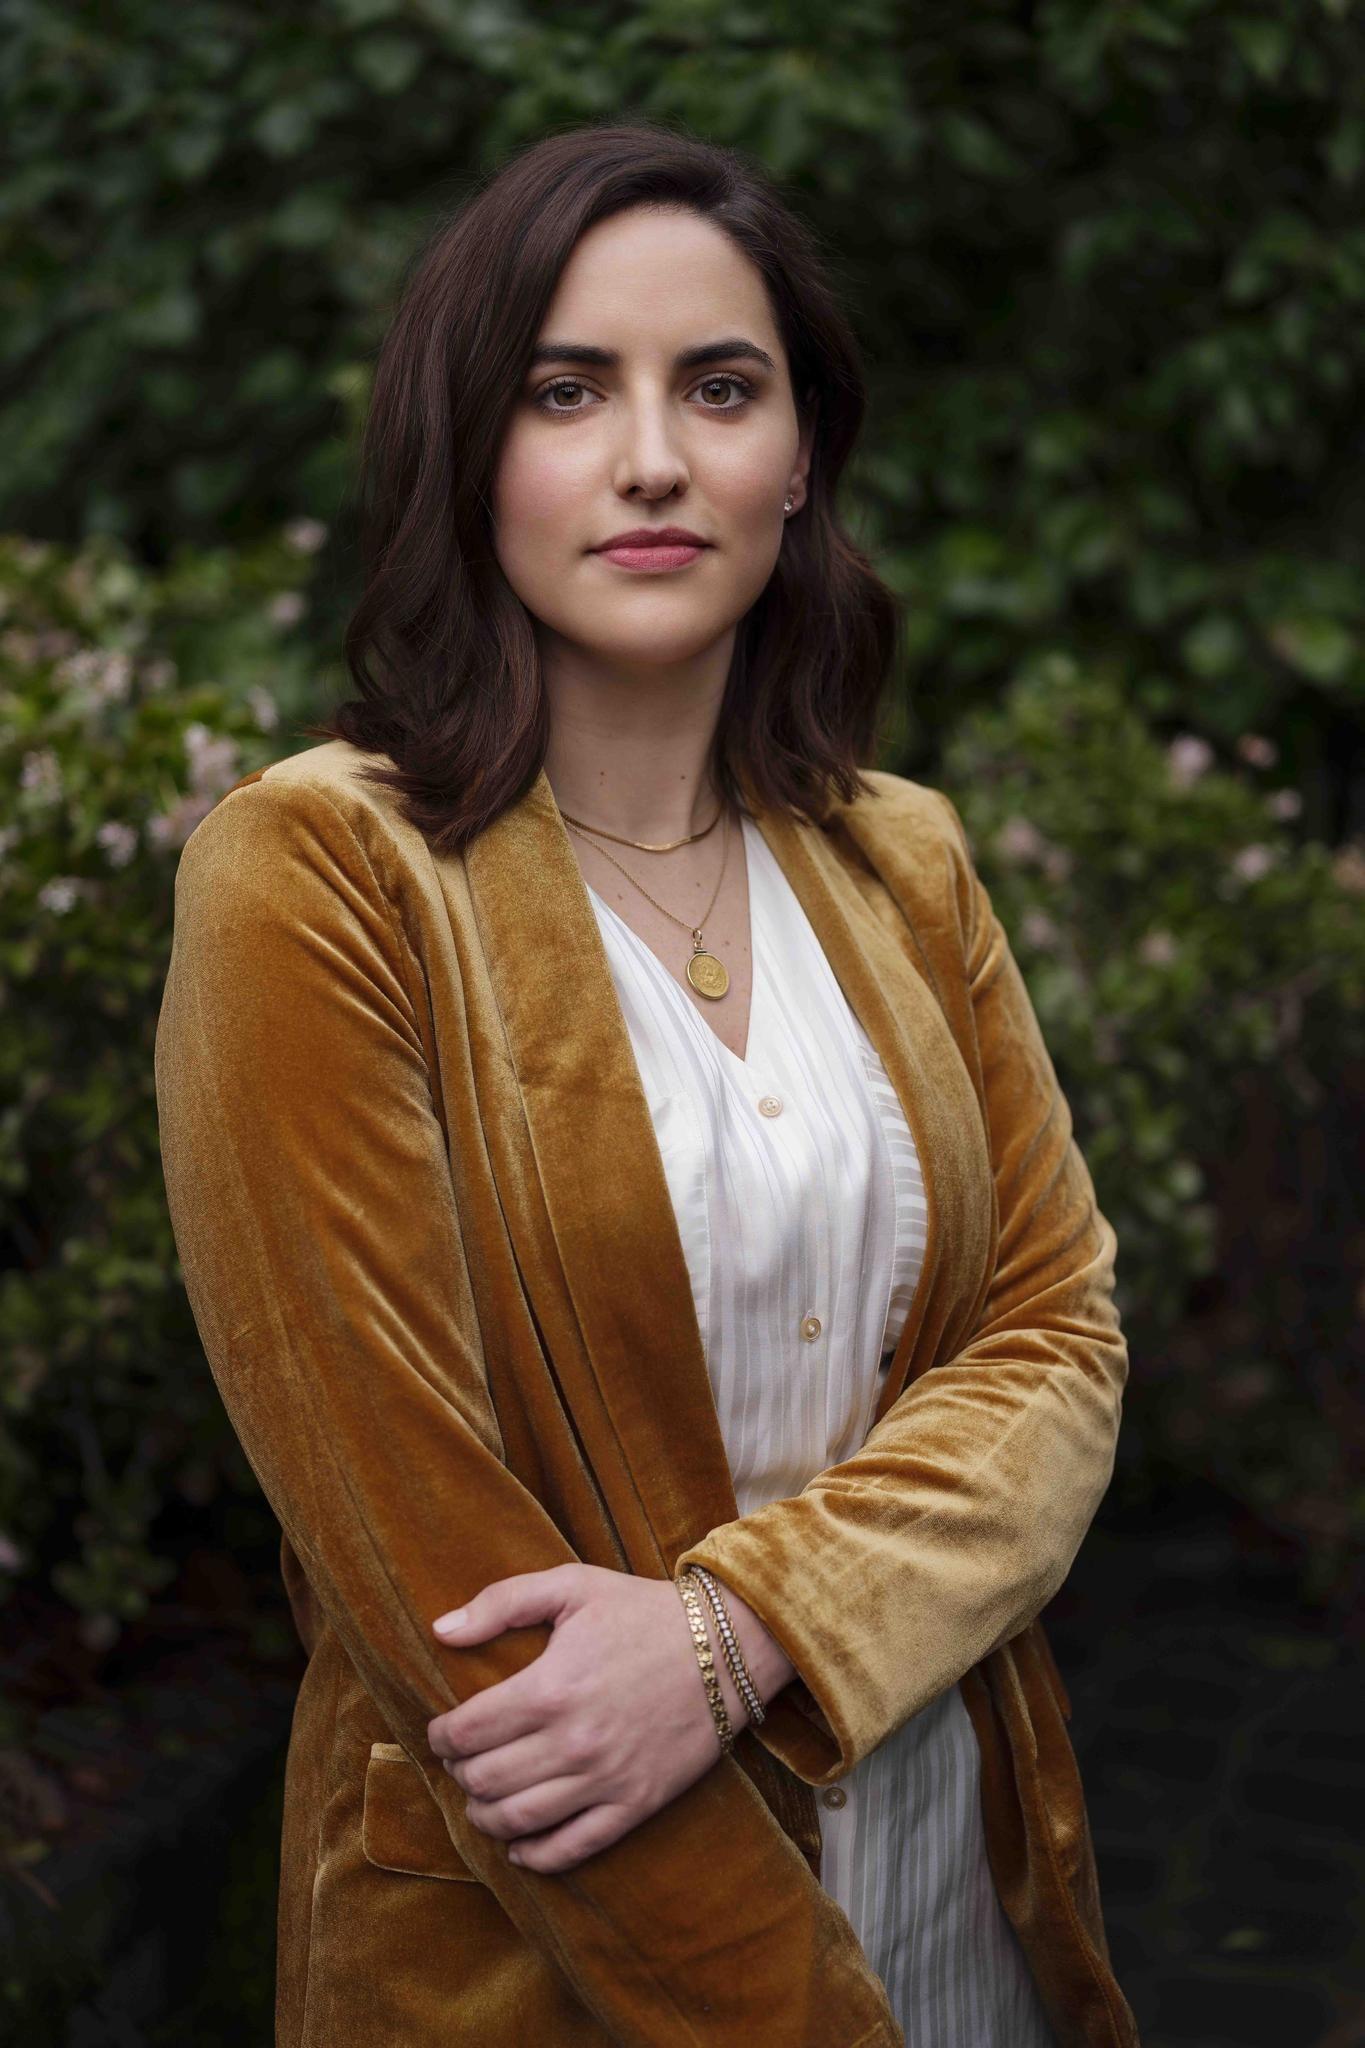 Ashley Nicholas